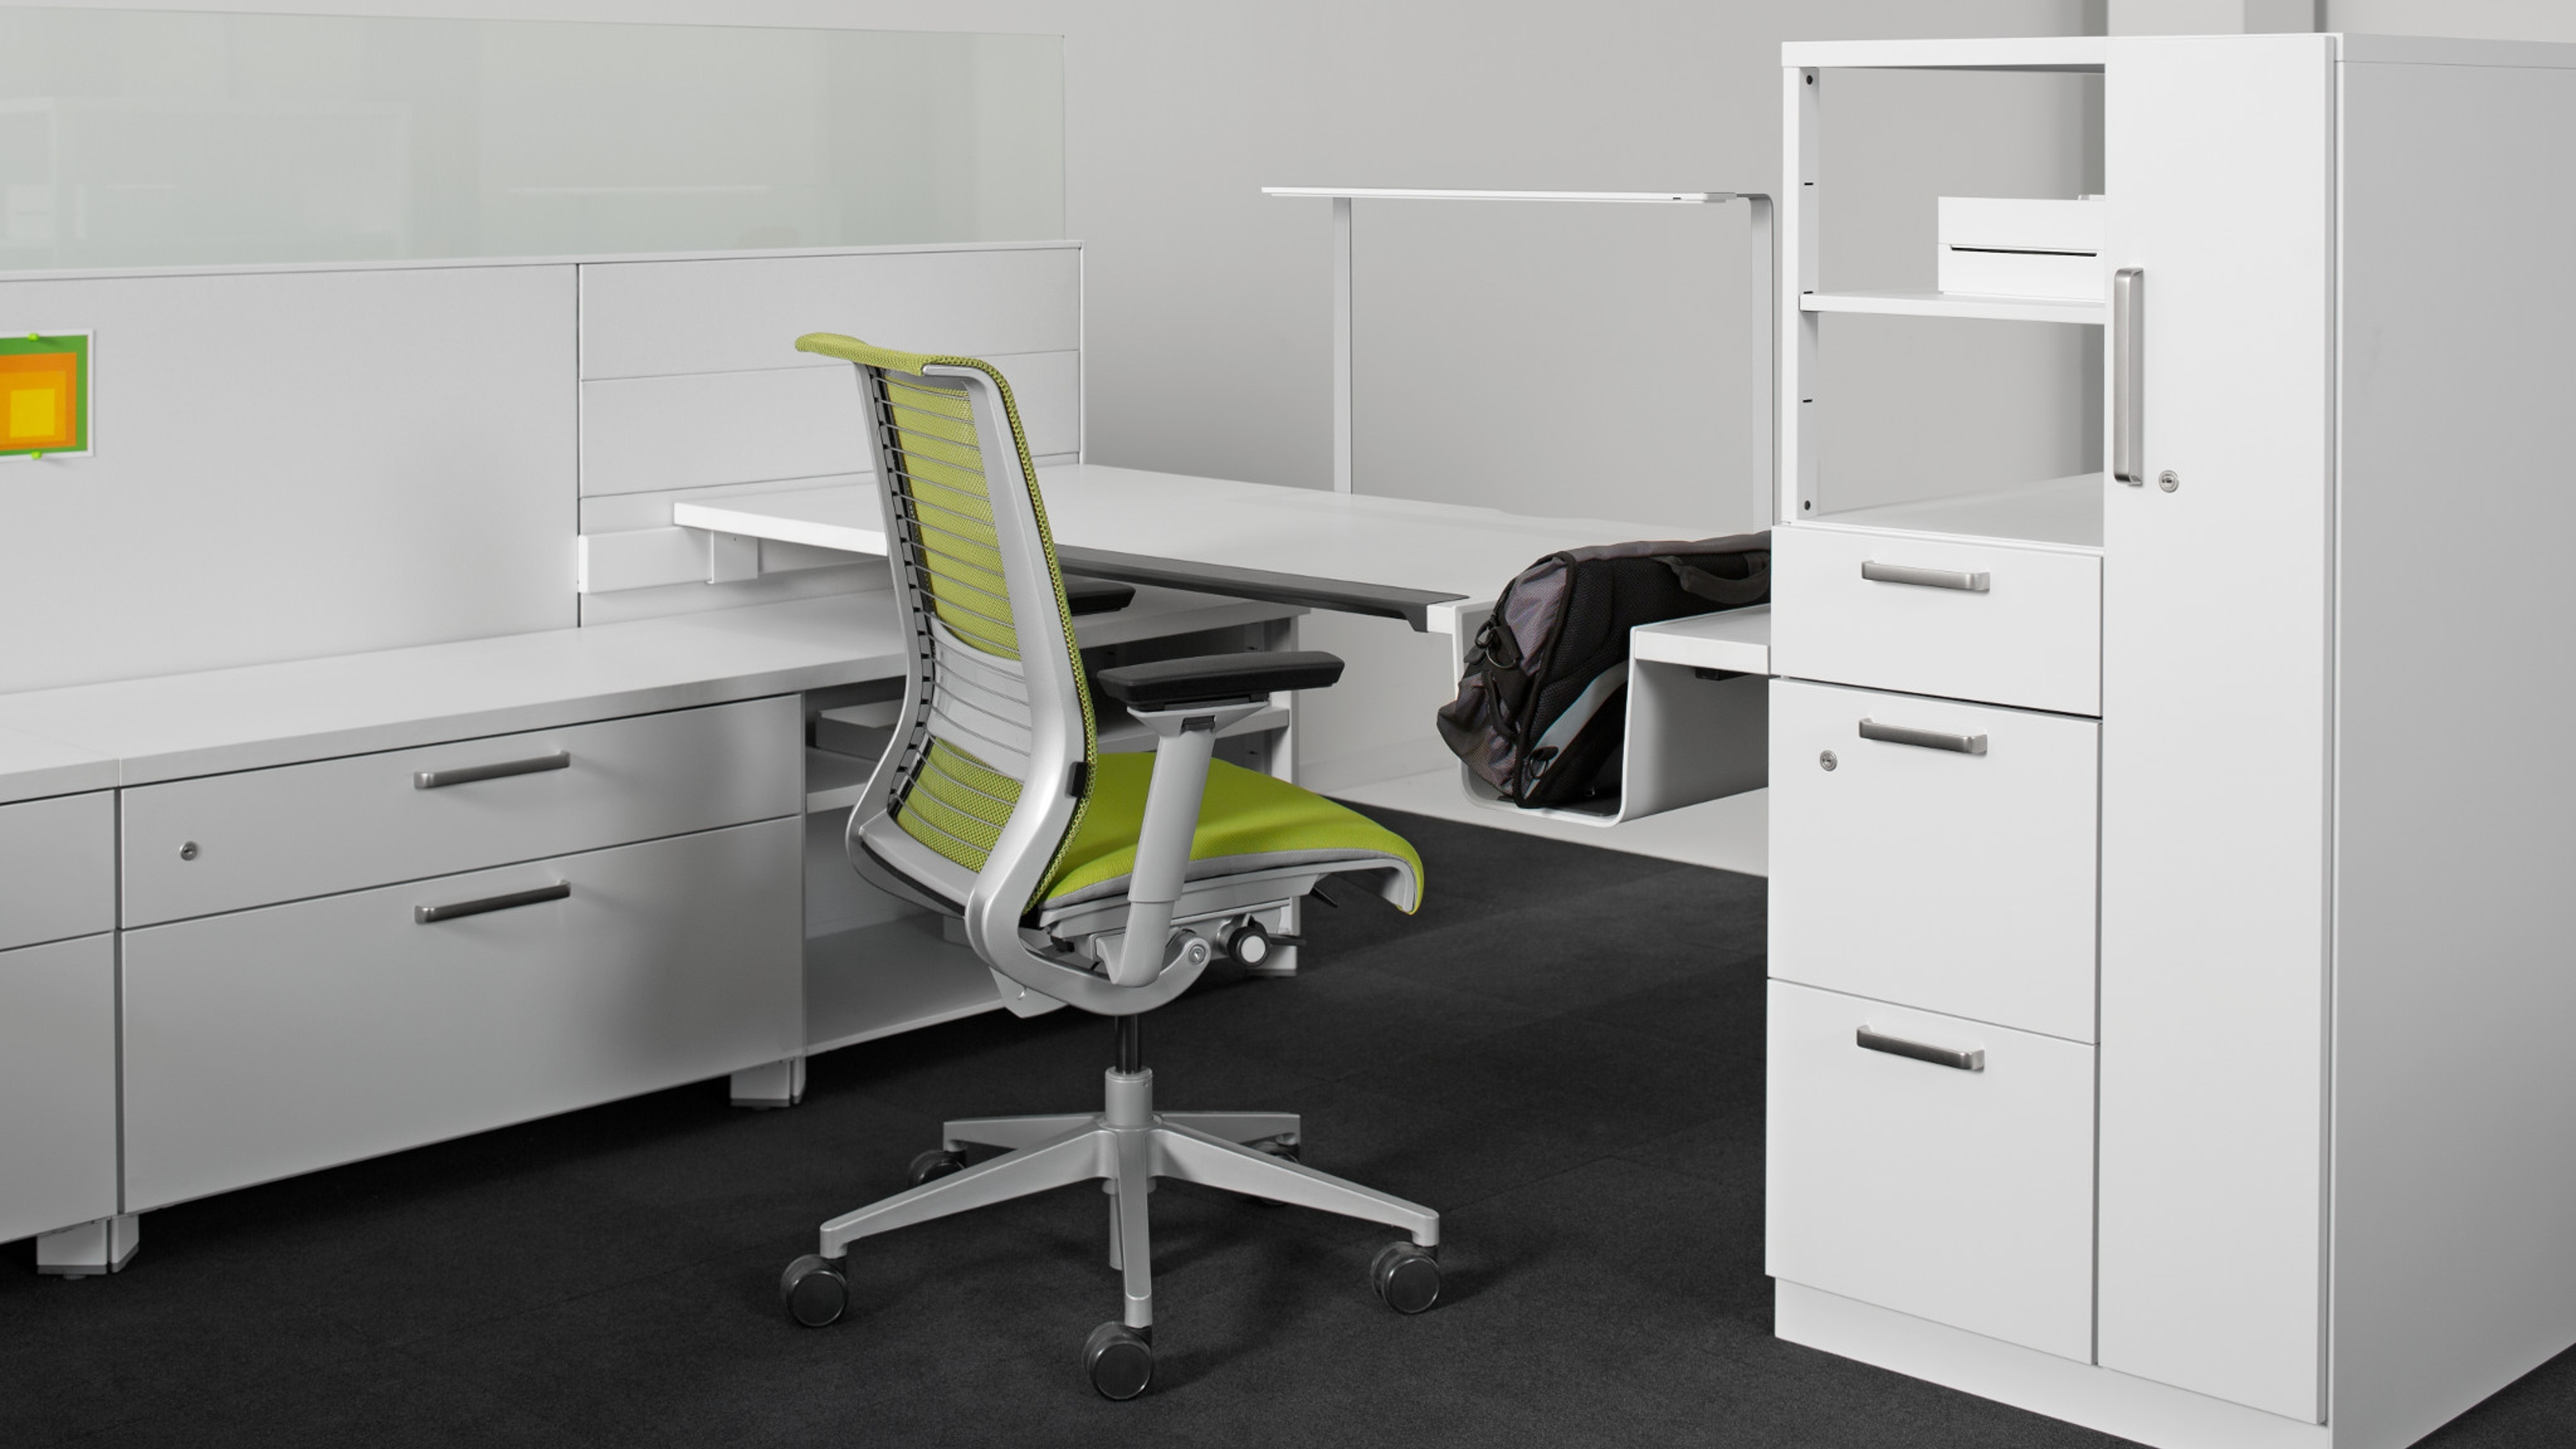 Led Personal Task Lighting Desk Lamps Steelcase